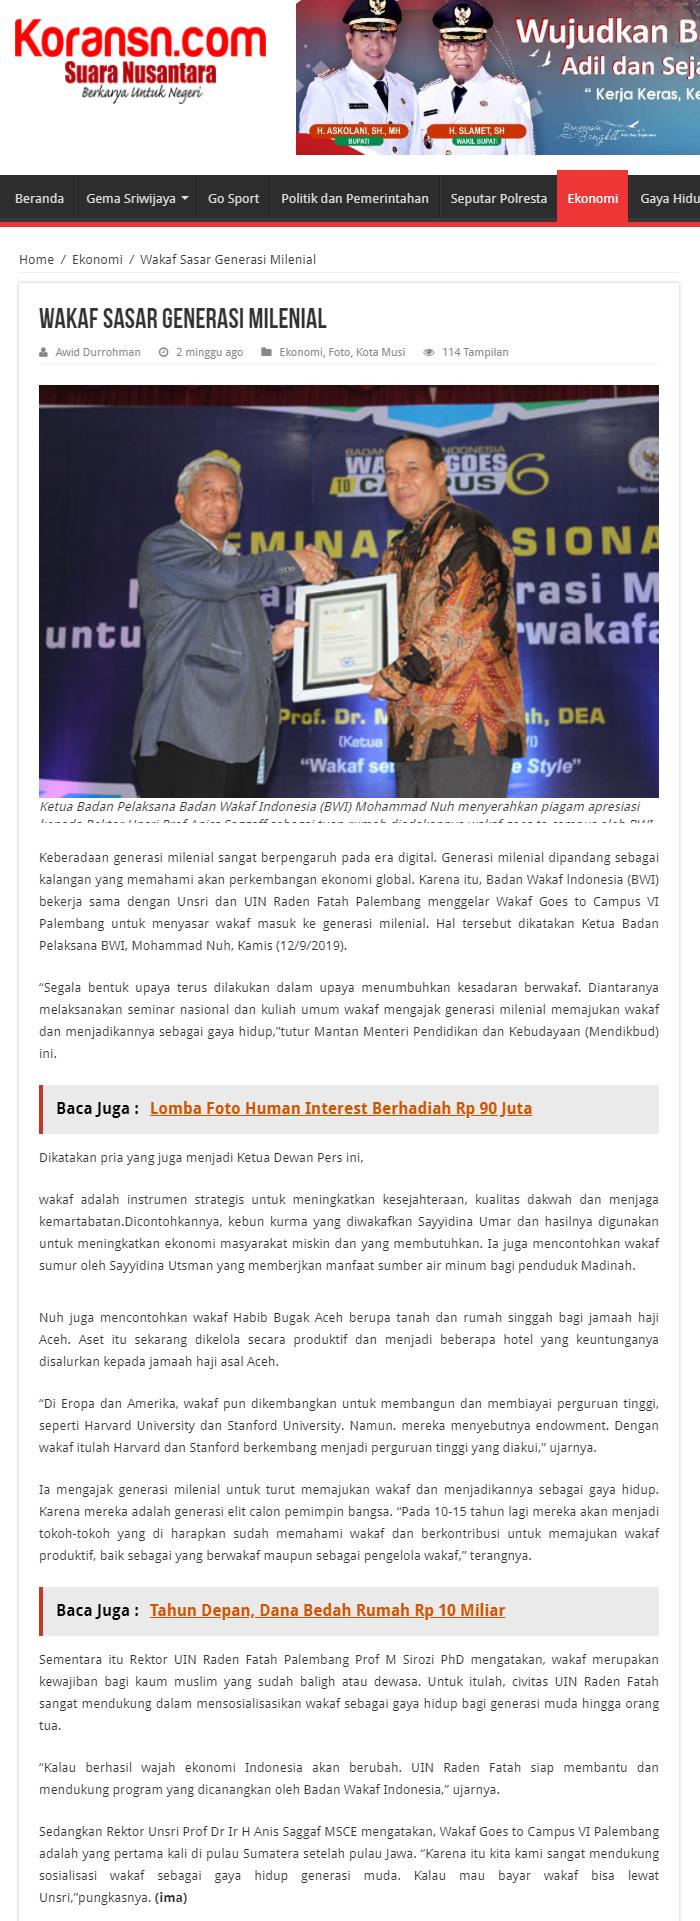 Wakaf Sasar Generasi Milenial  - screenshot koransn - Wakaf Sasar Generasi Milenial